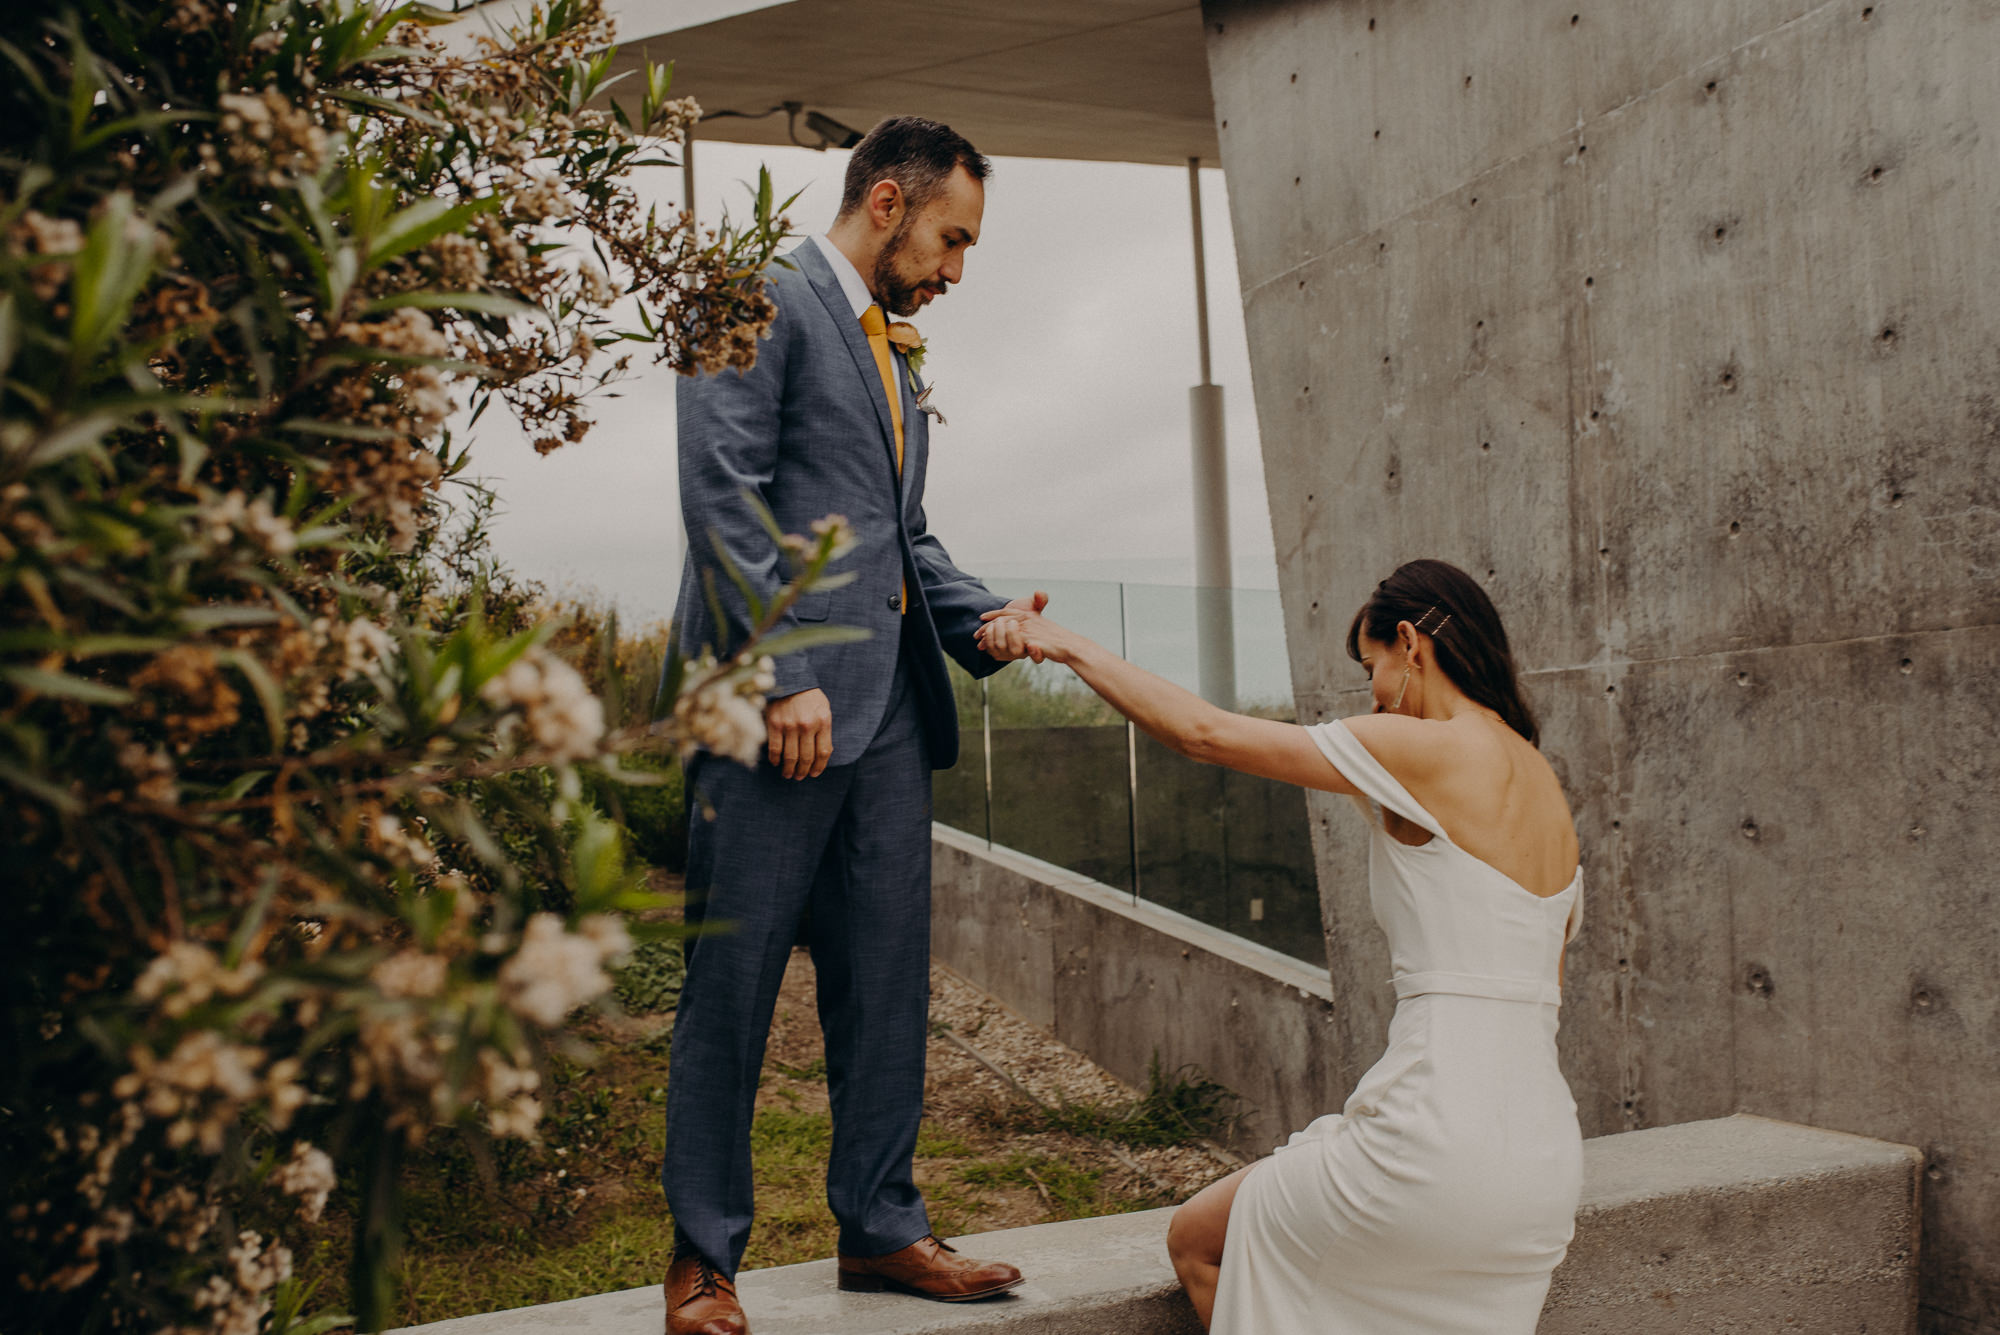 elopement photographer in los angeles - la wedding photographer - isaiahandtaylor.com-043.jpg